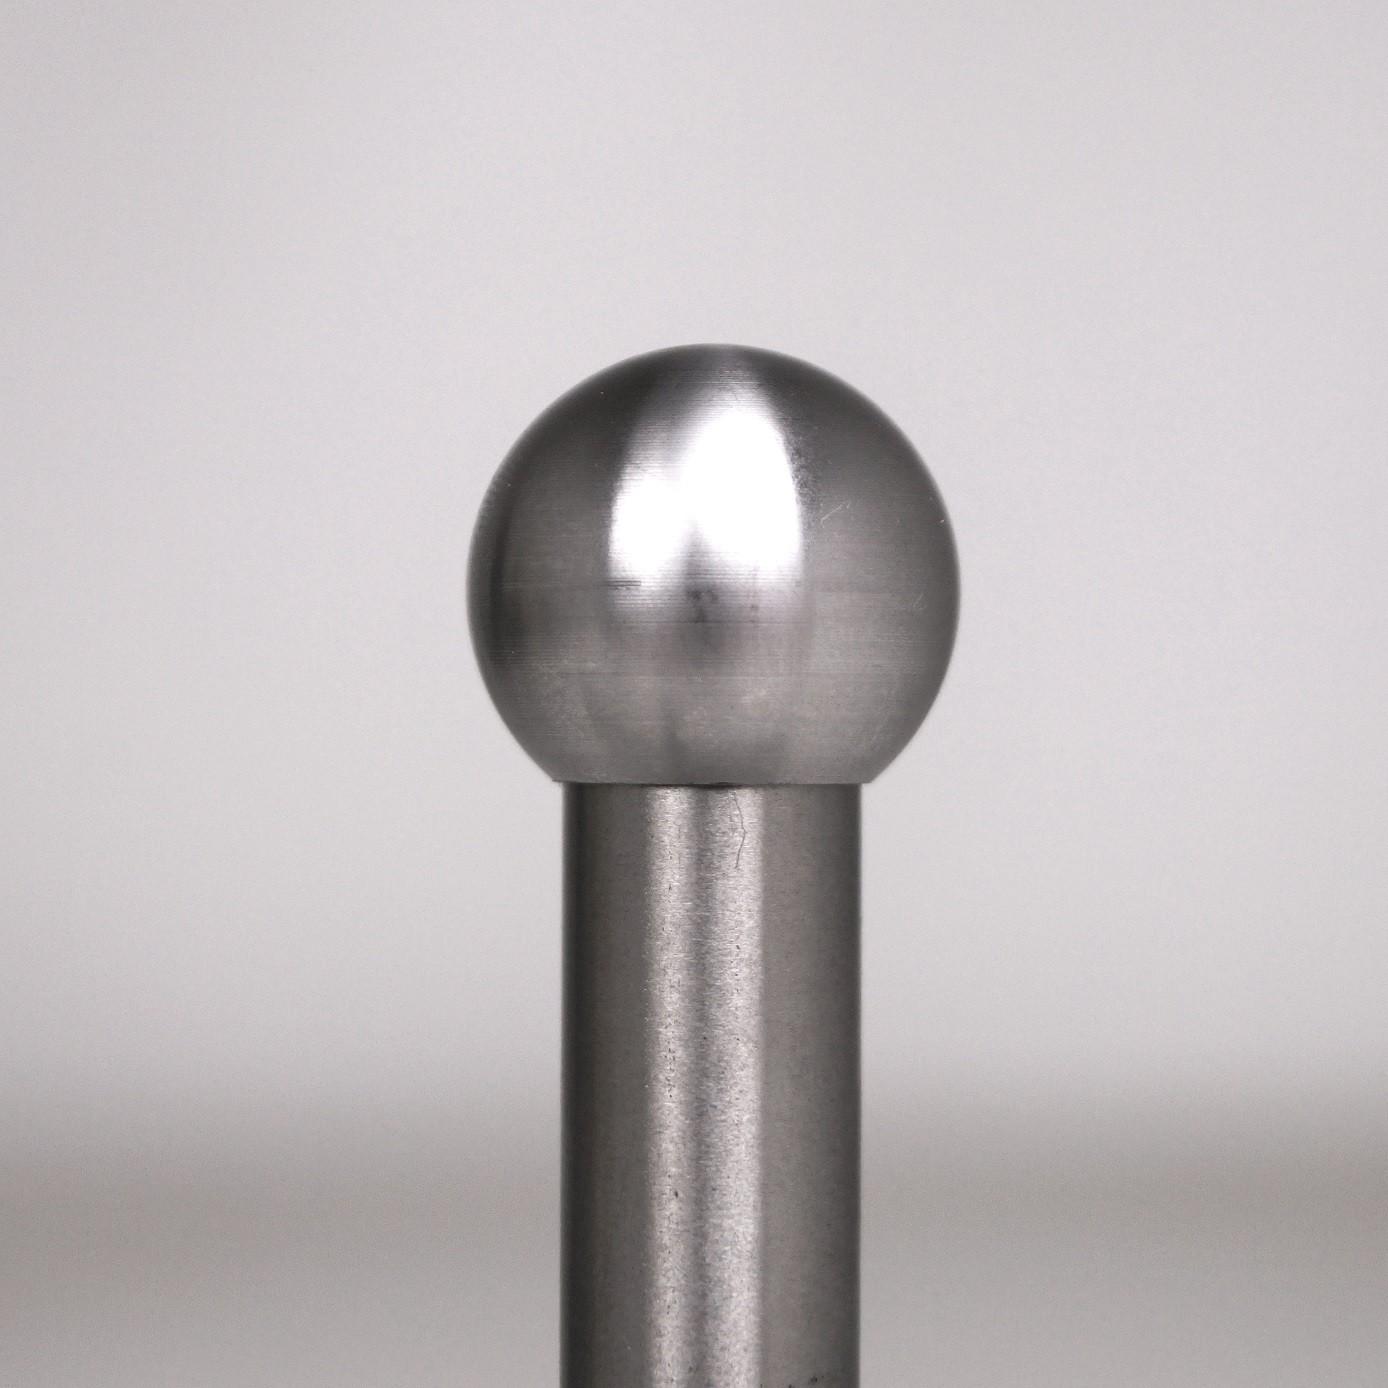 Edelstahl Kugelkappe Endkappe für Füllstab Rundstab Rohr V2A